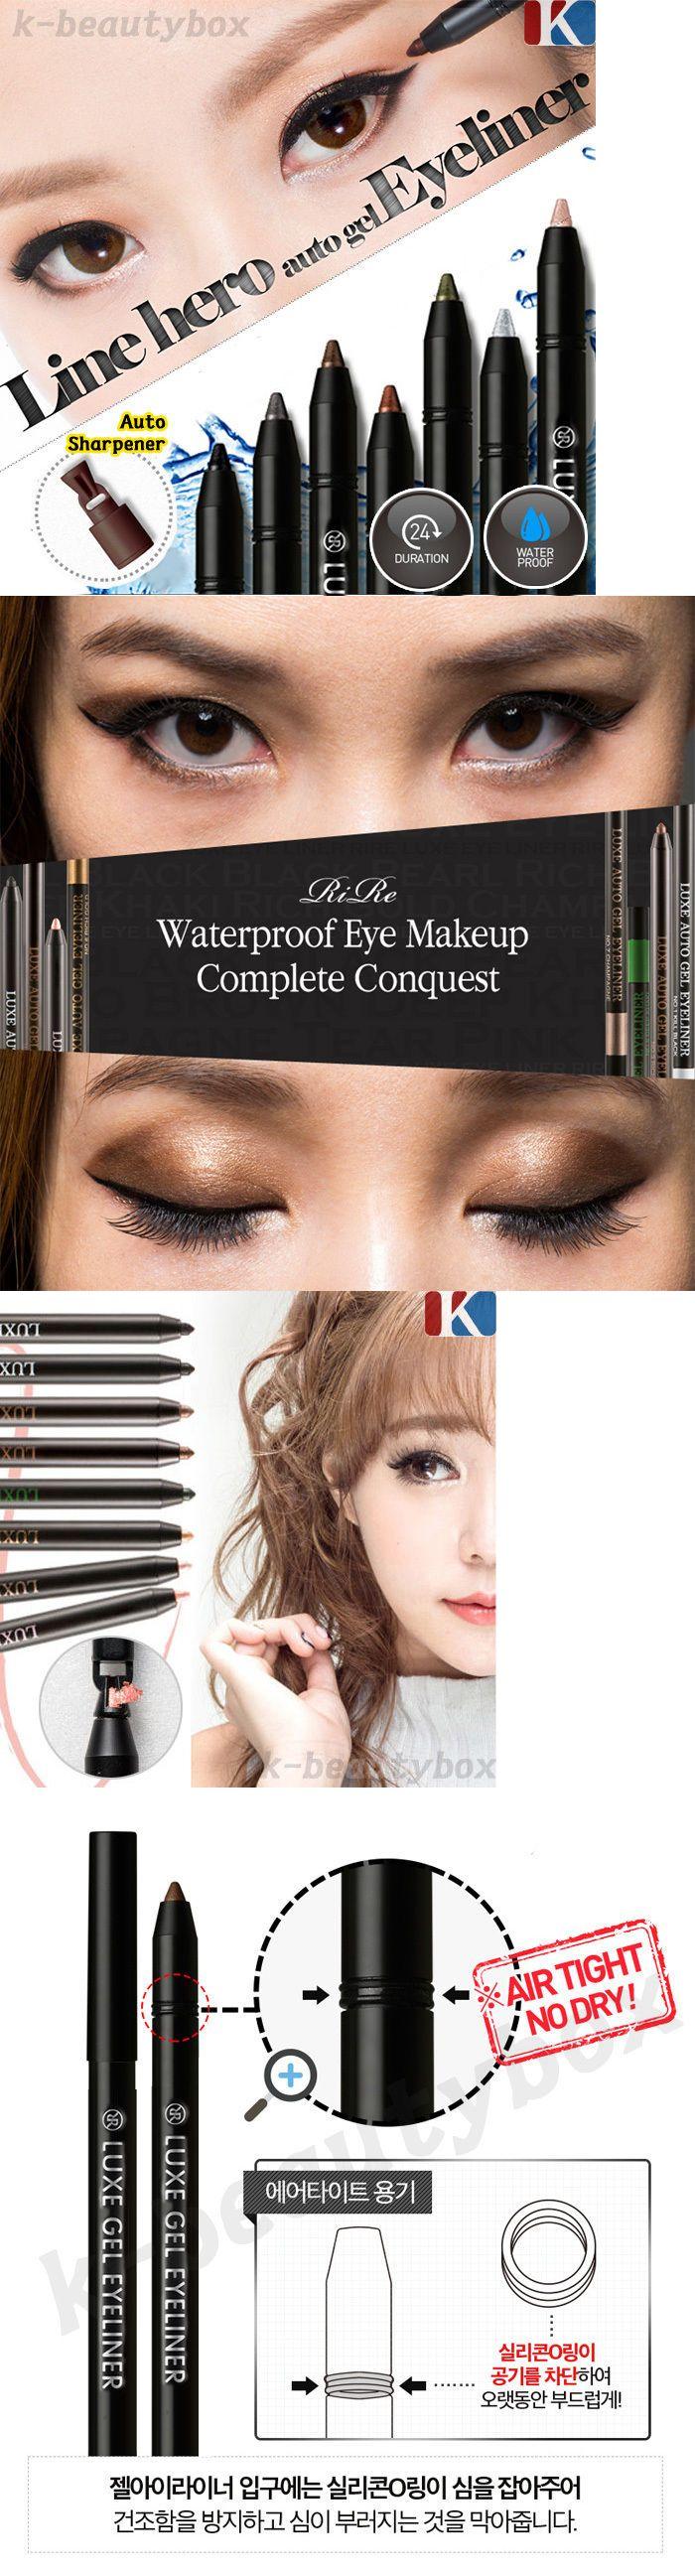 Eye Shadow Liner Combination: Gel Eyeliner 10 Color Rire Luxe Auto Eyeliner Pencil Waterpoof Korean Cosmetics -> BUY IT NOW ONLY: $43.23 on eBay!